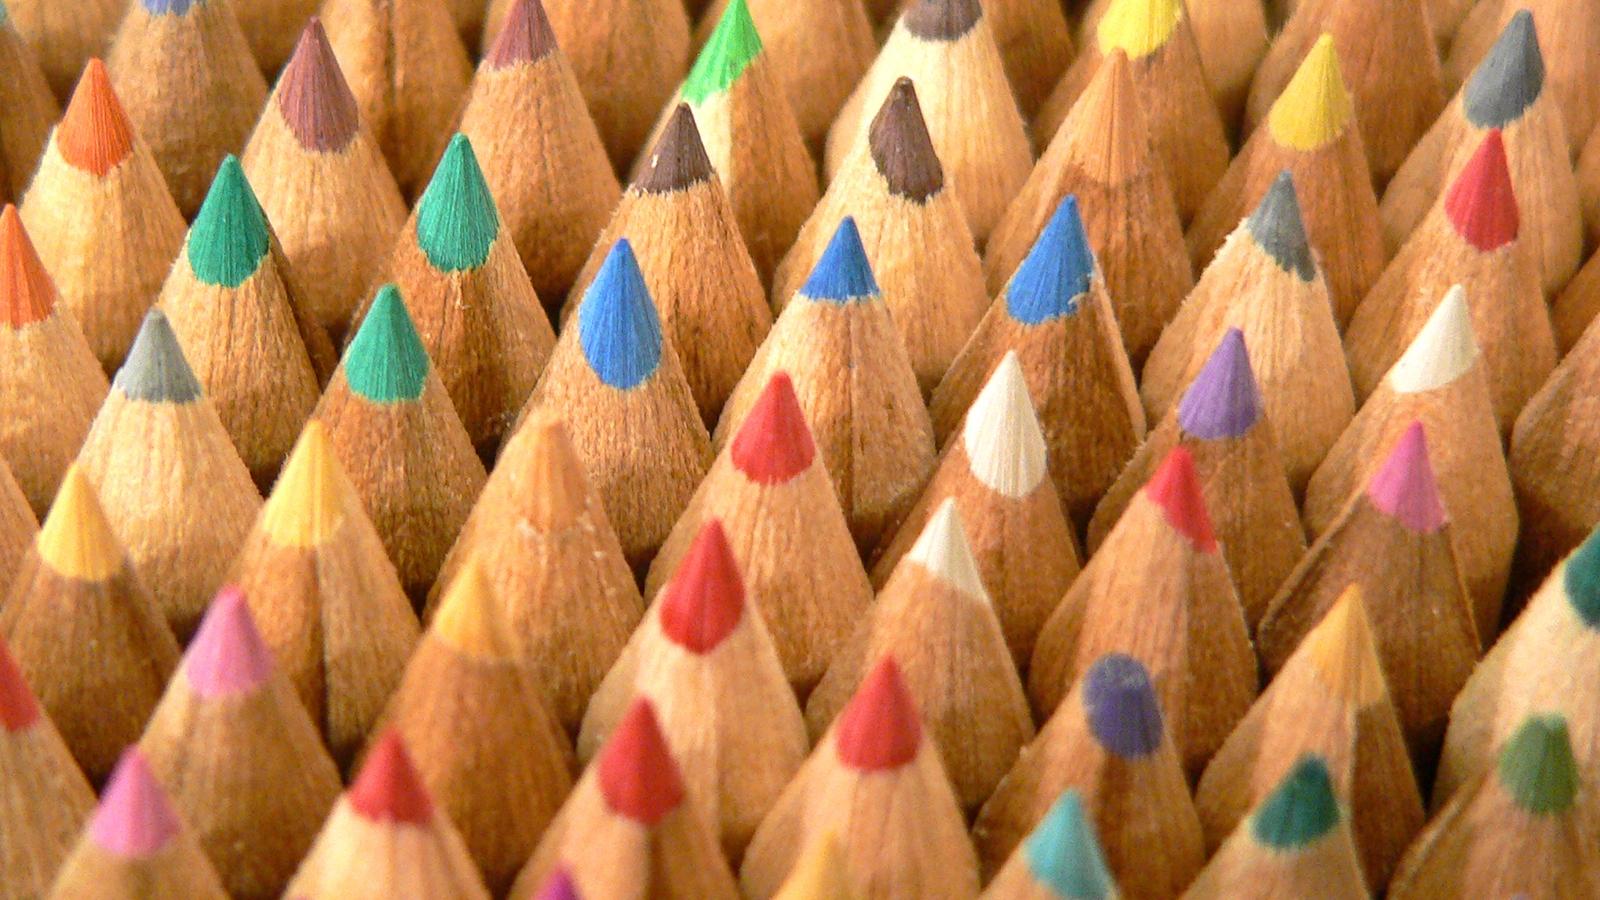 crayons-textute-front-1189541-1600x1200.jpg